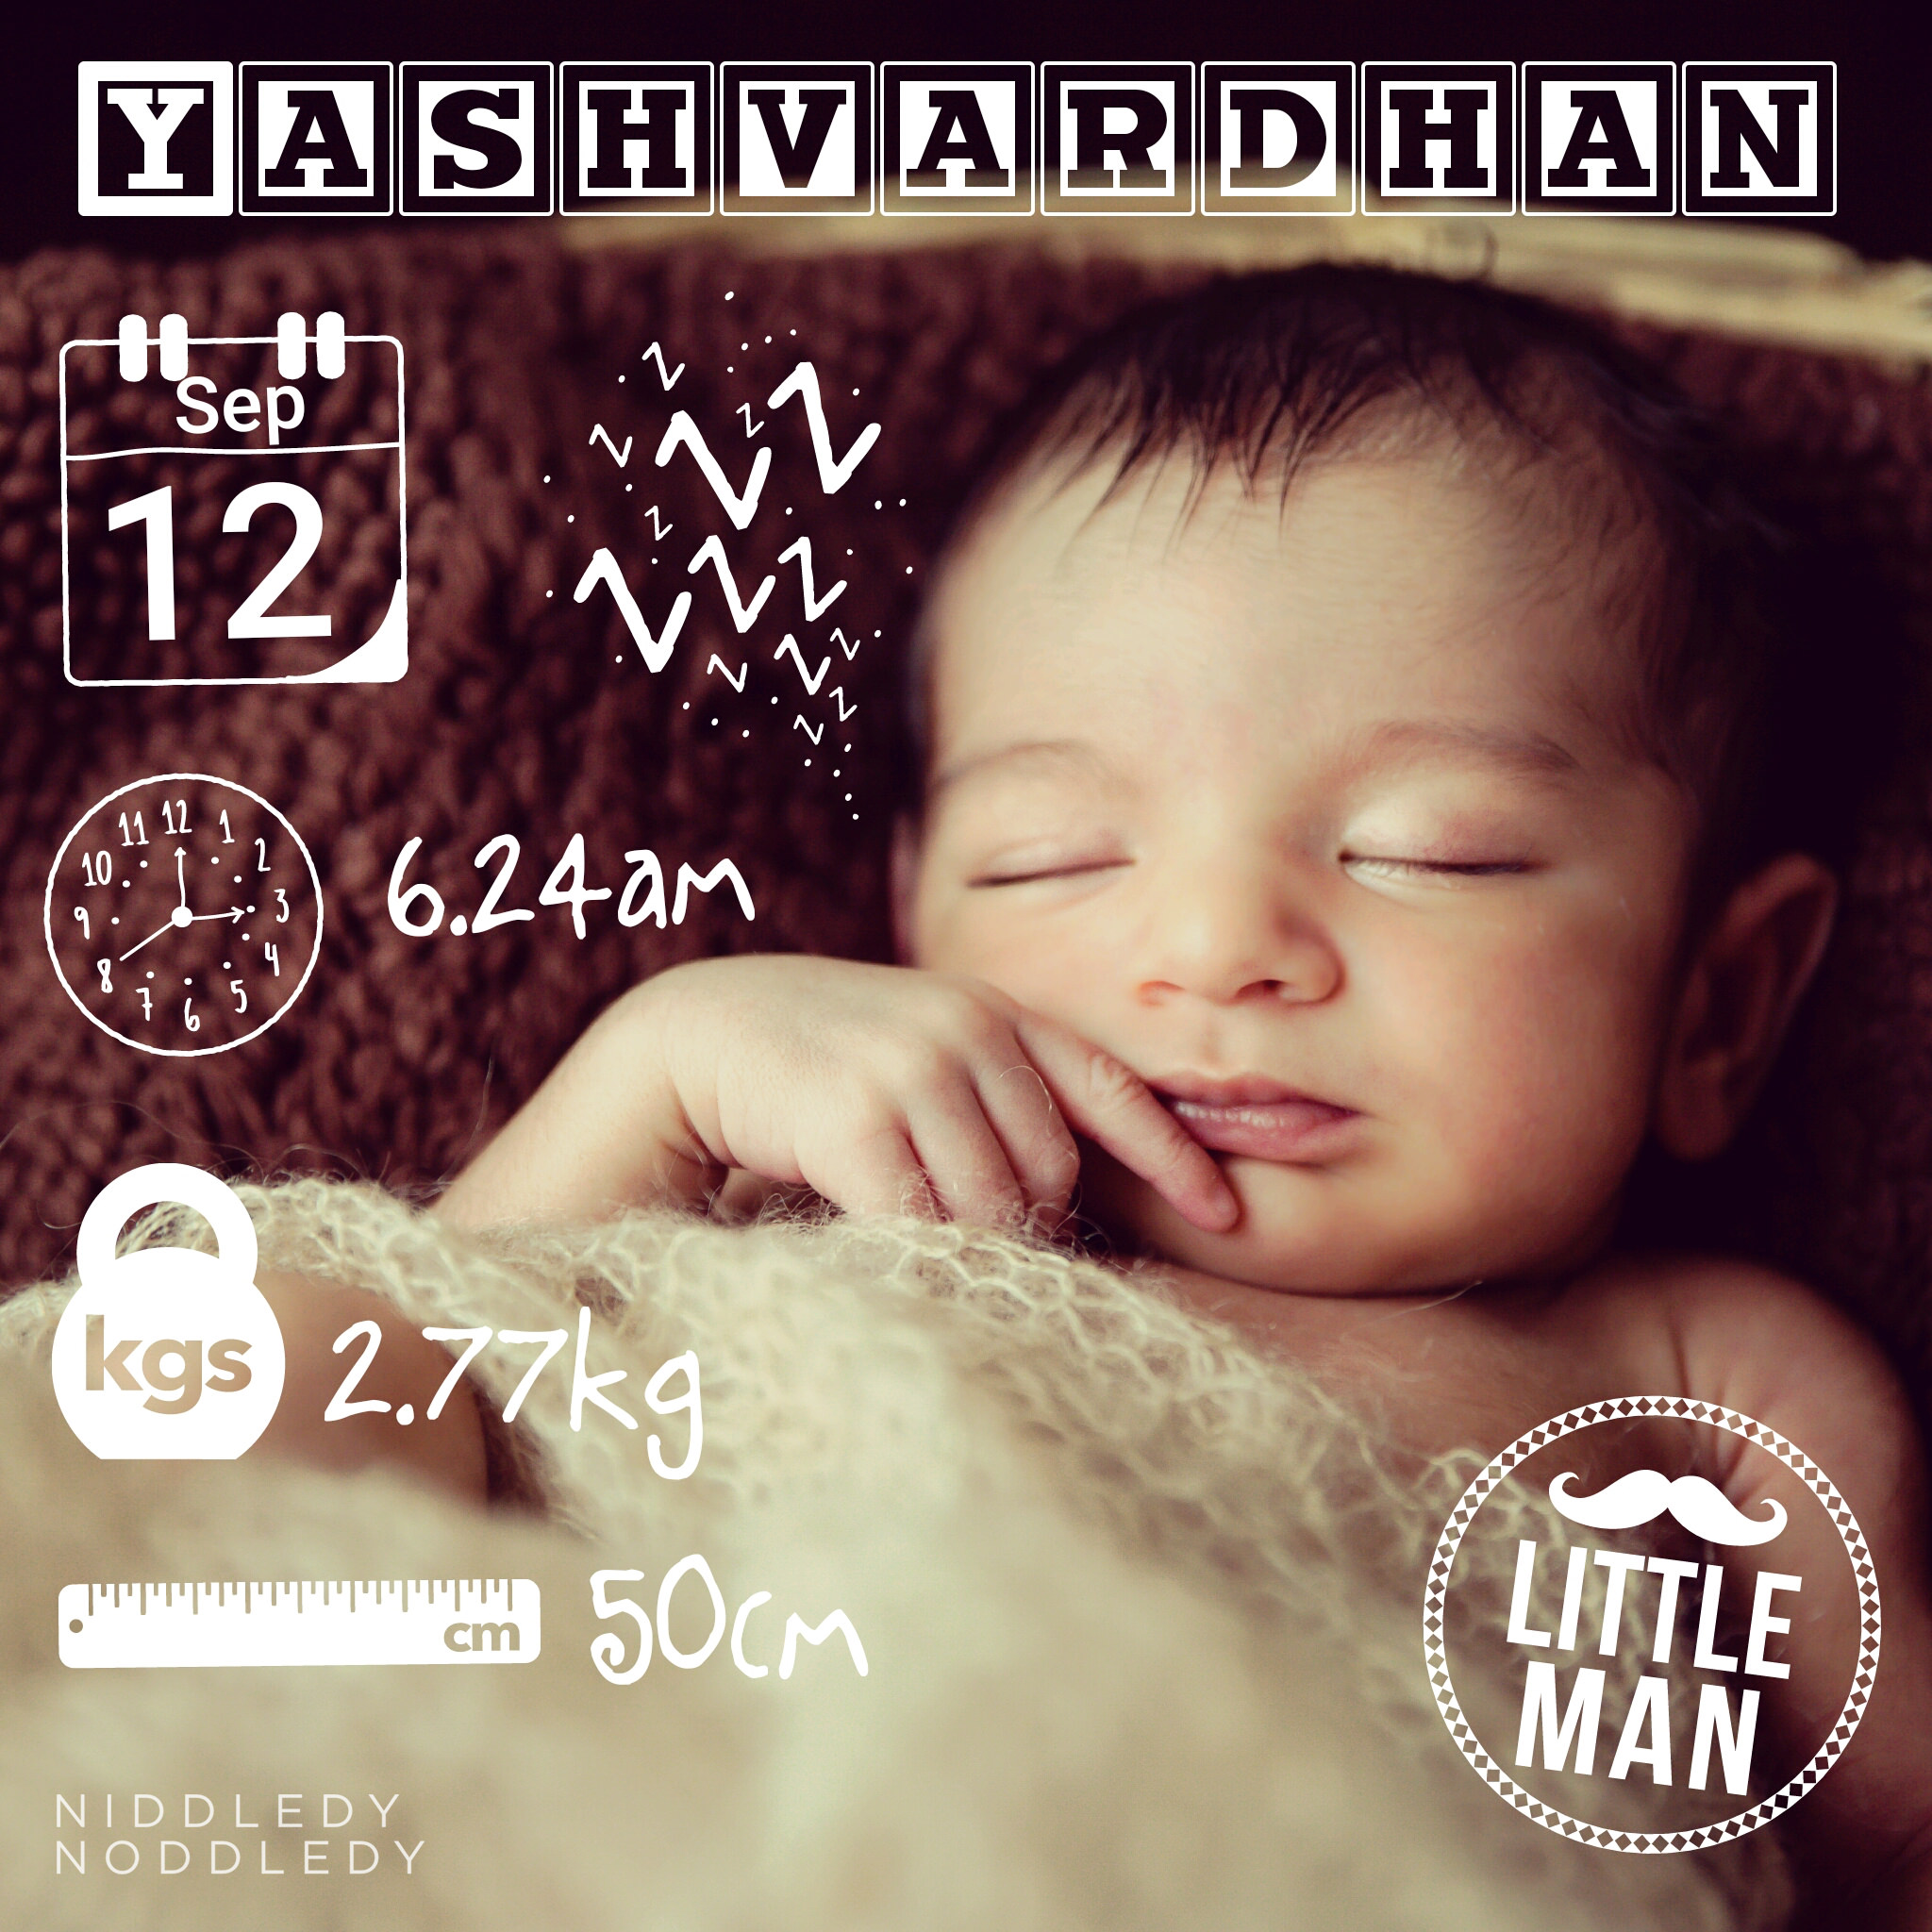 Yashvardhan Newborn Photoshoot ❤ NiddledyNoddledy.com ~ Bumps to Babies Photography, Kolkata - 01.jpg